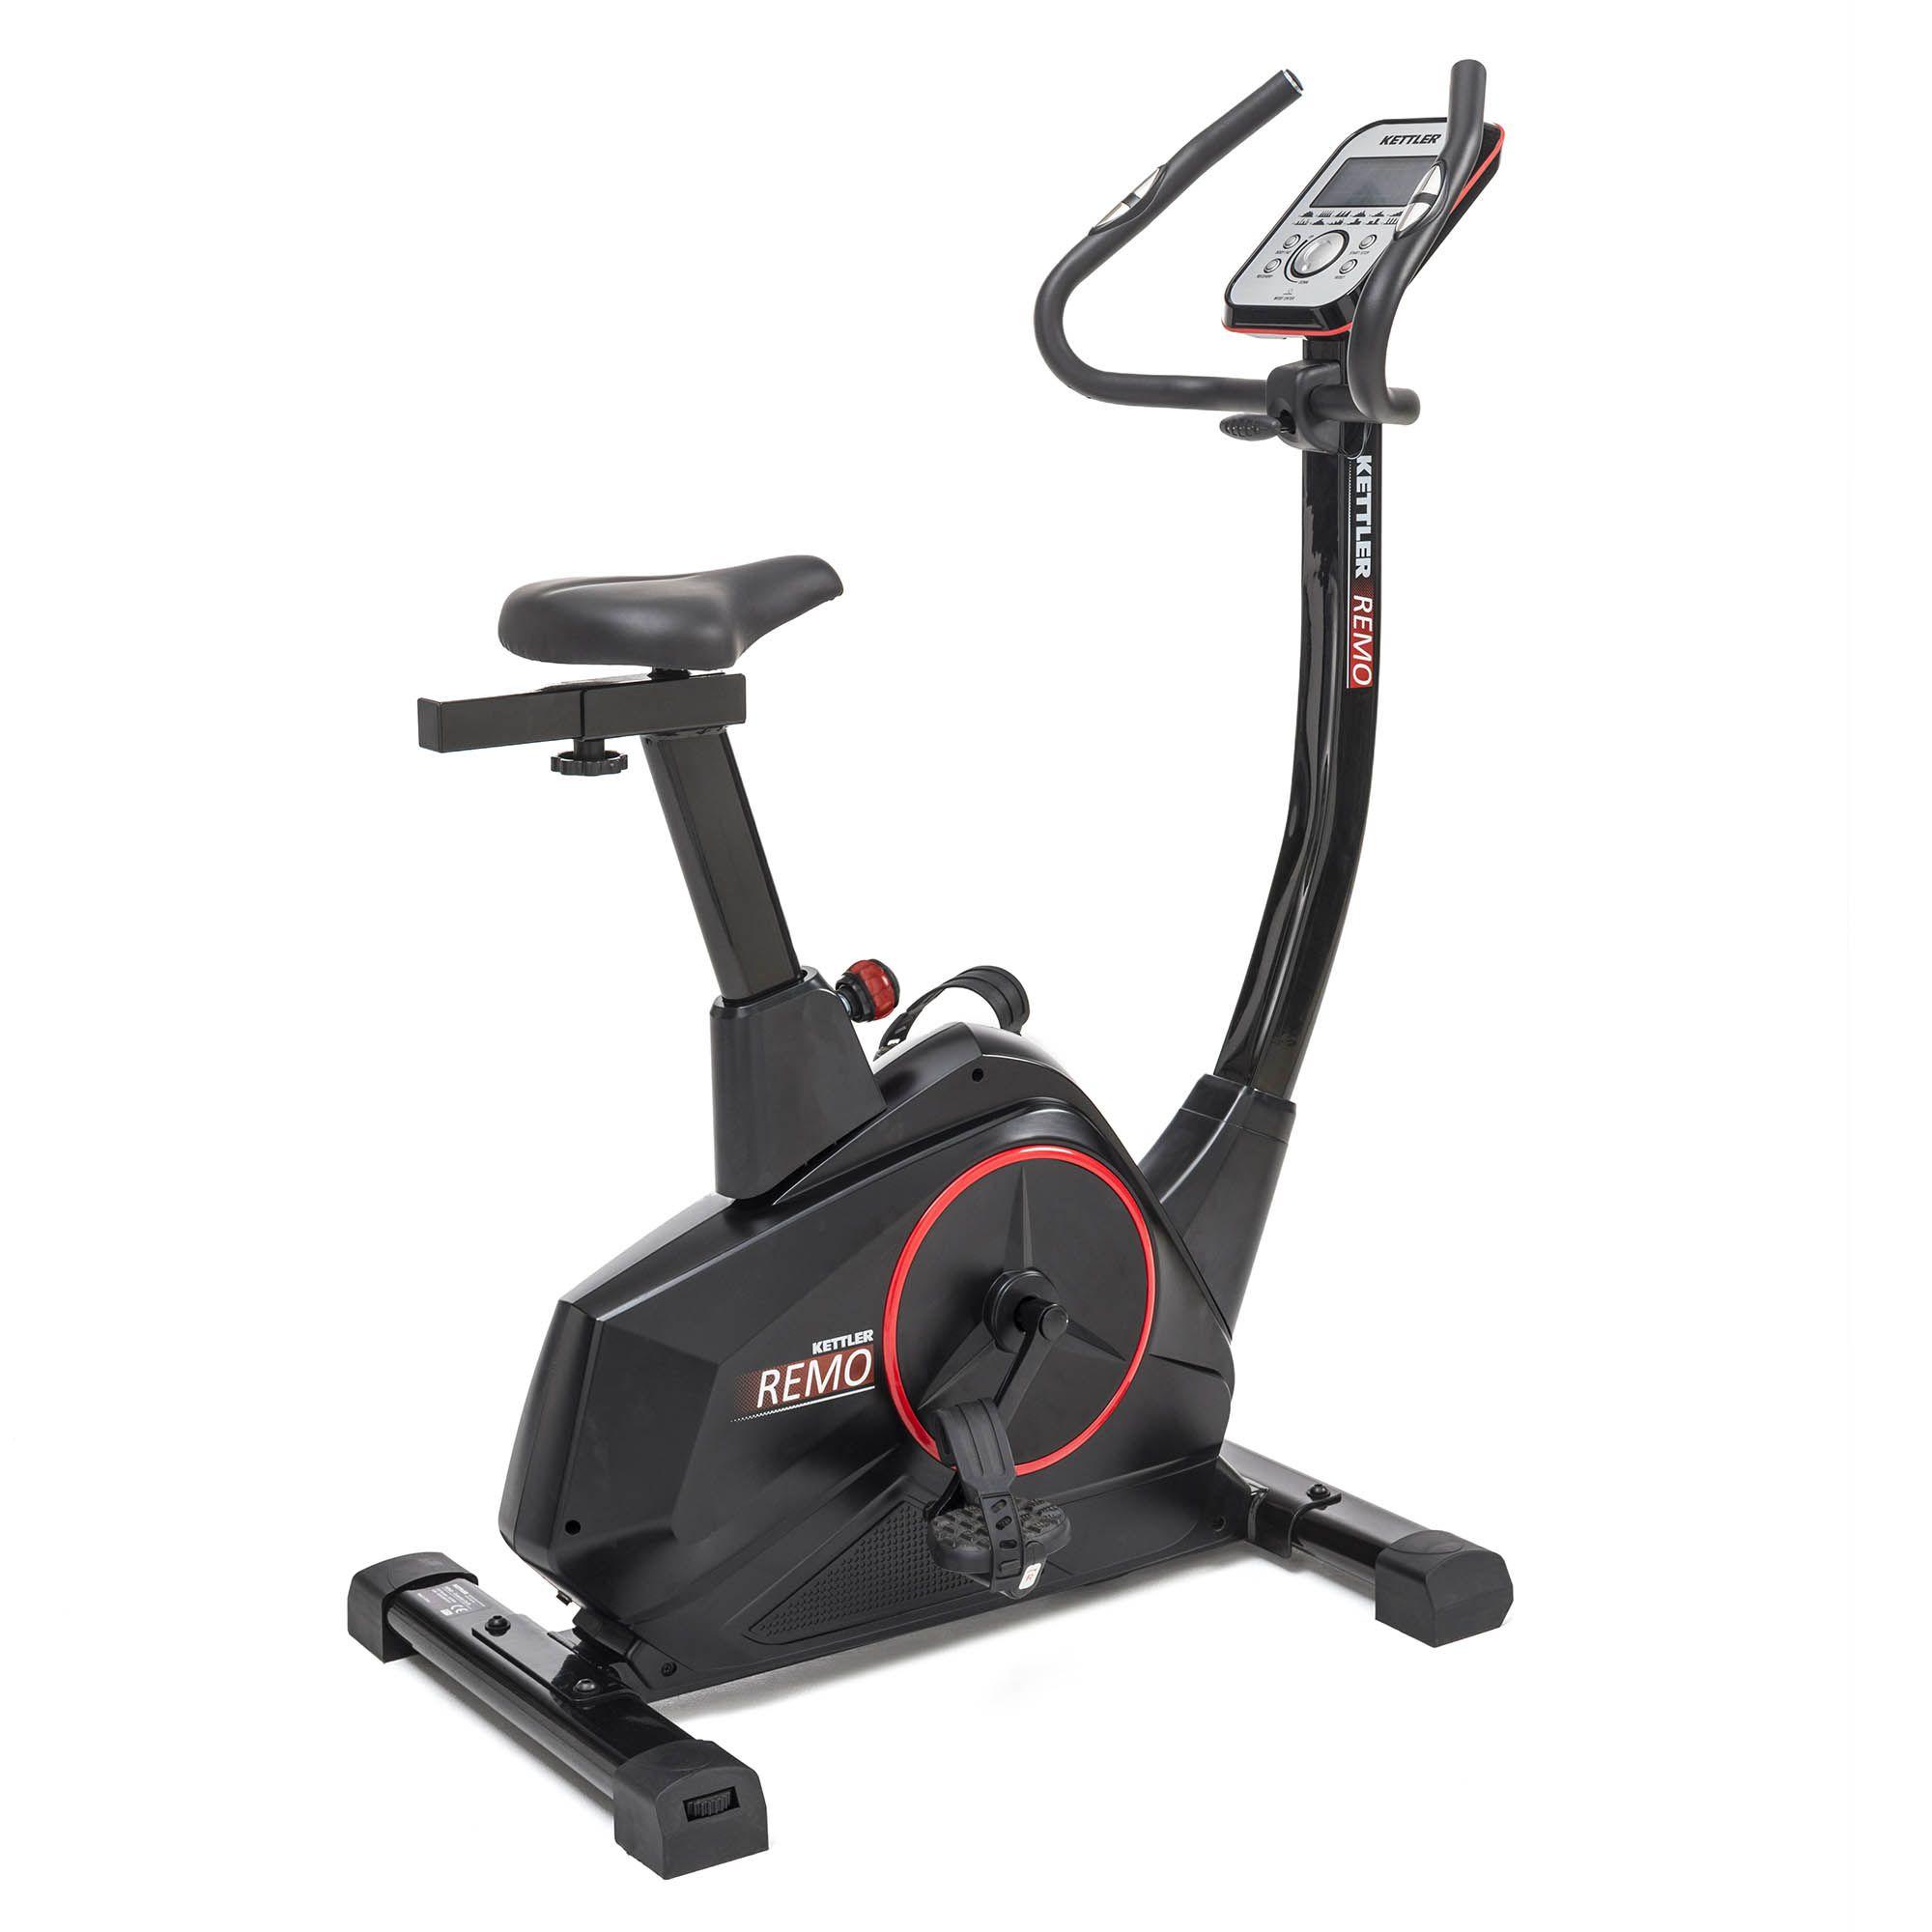 Kettler Remo Exercise Bike Sweatband Com